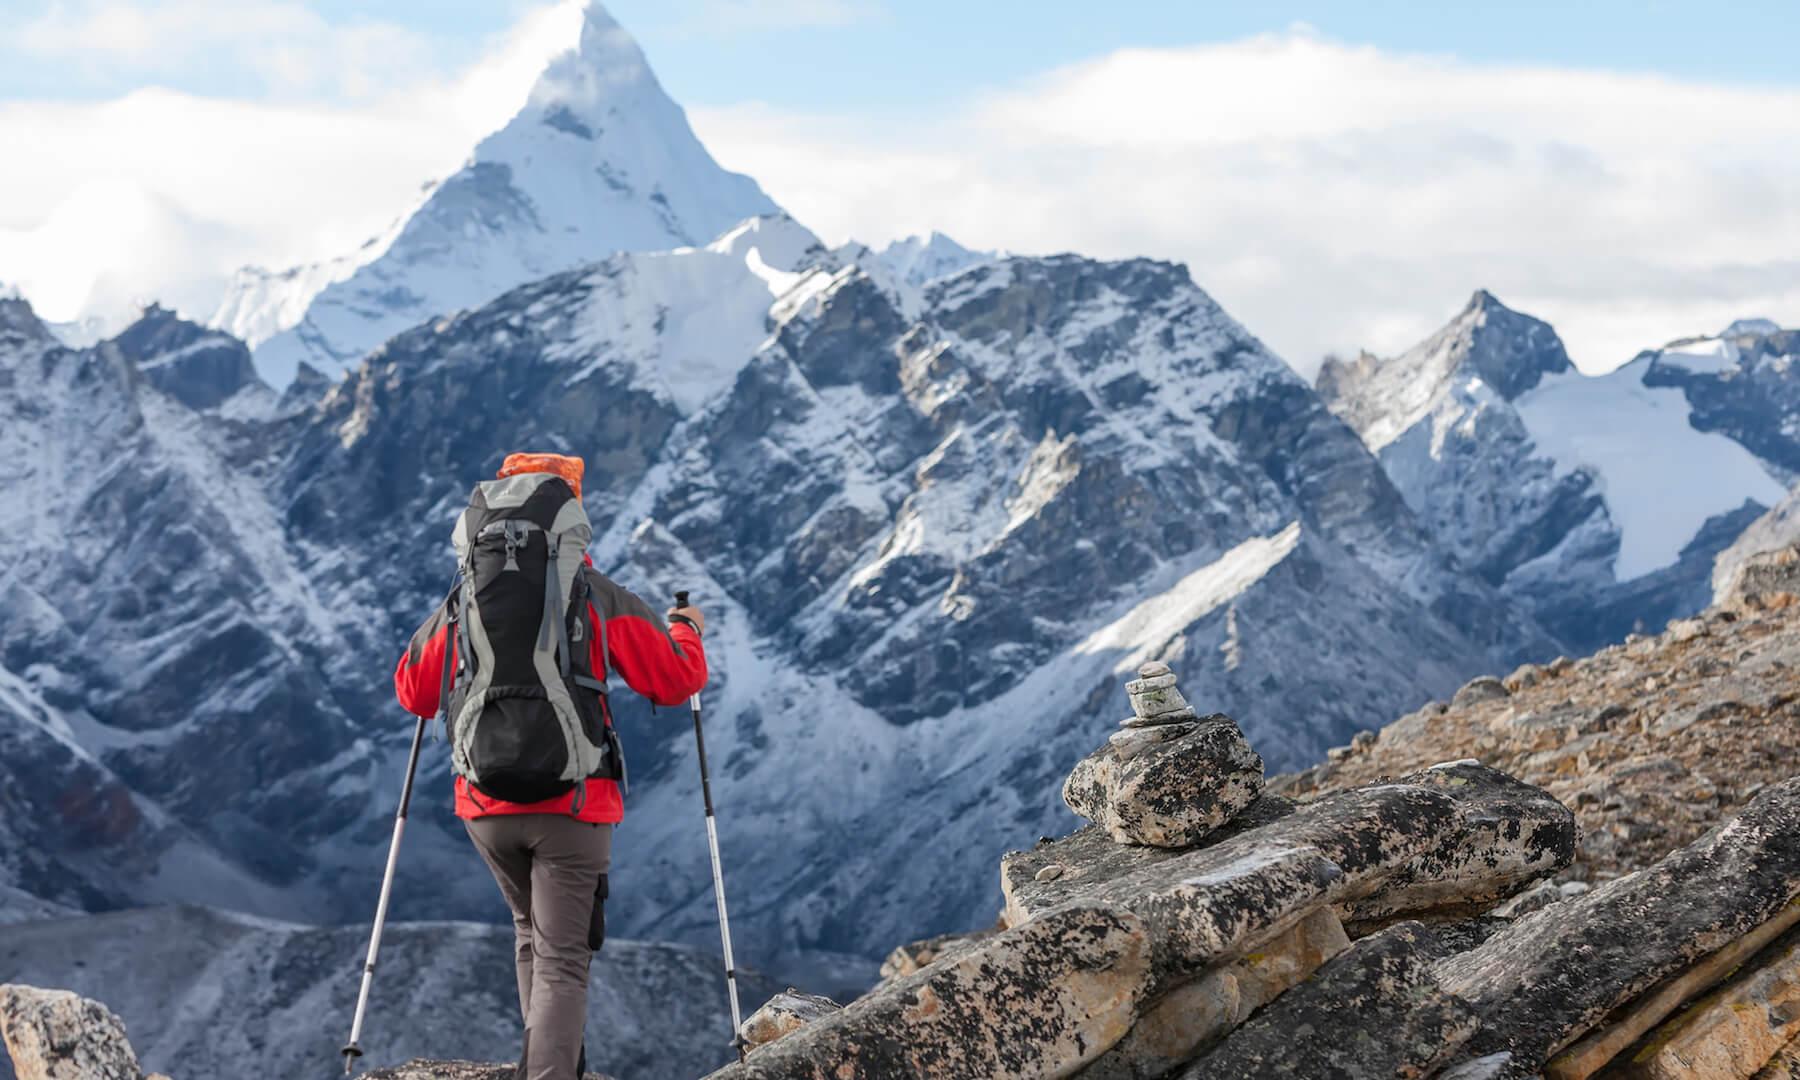 Hiker walks on trail in Himalayas